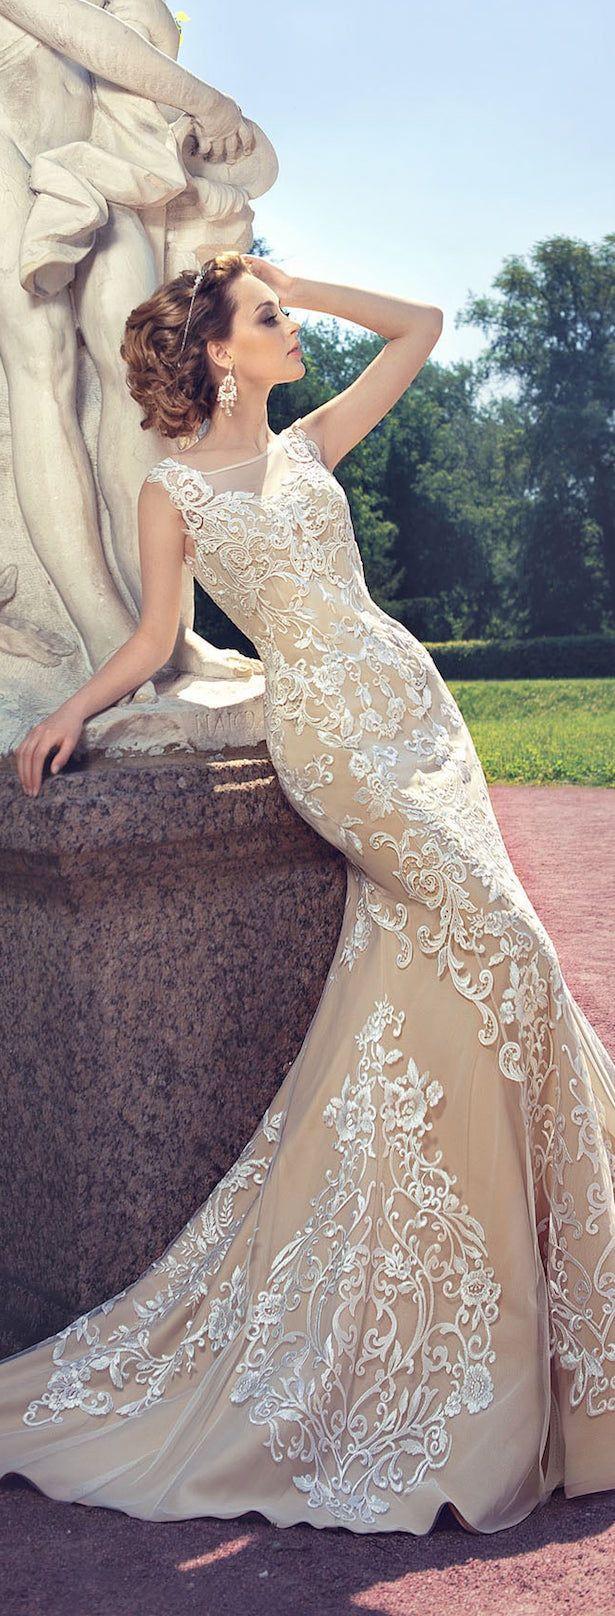 Milva 2016 Wedding Dresses